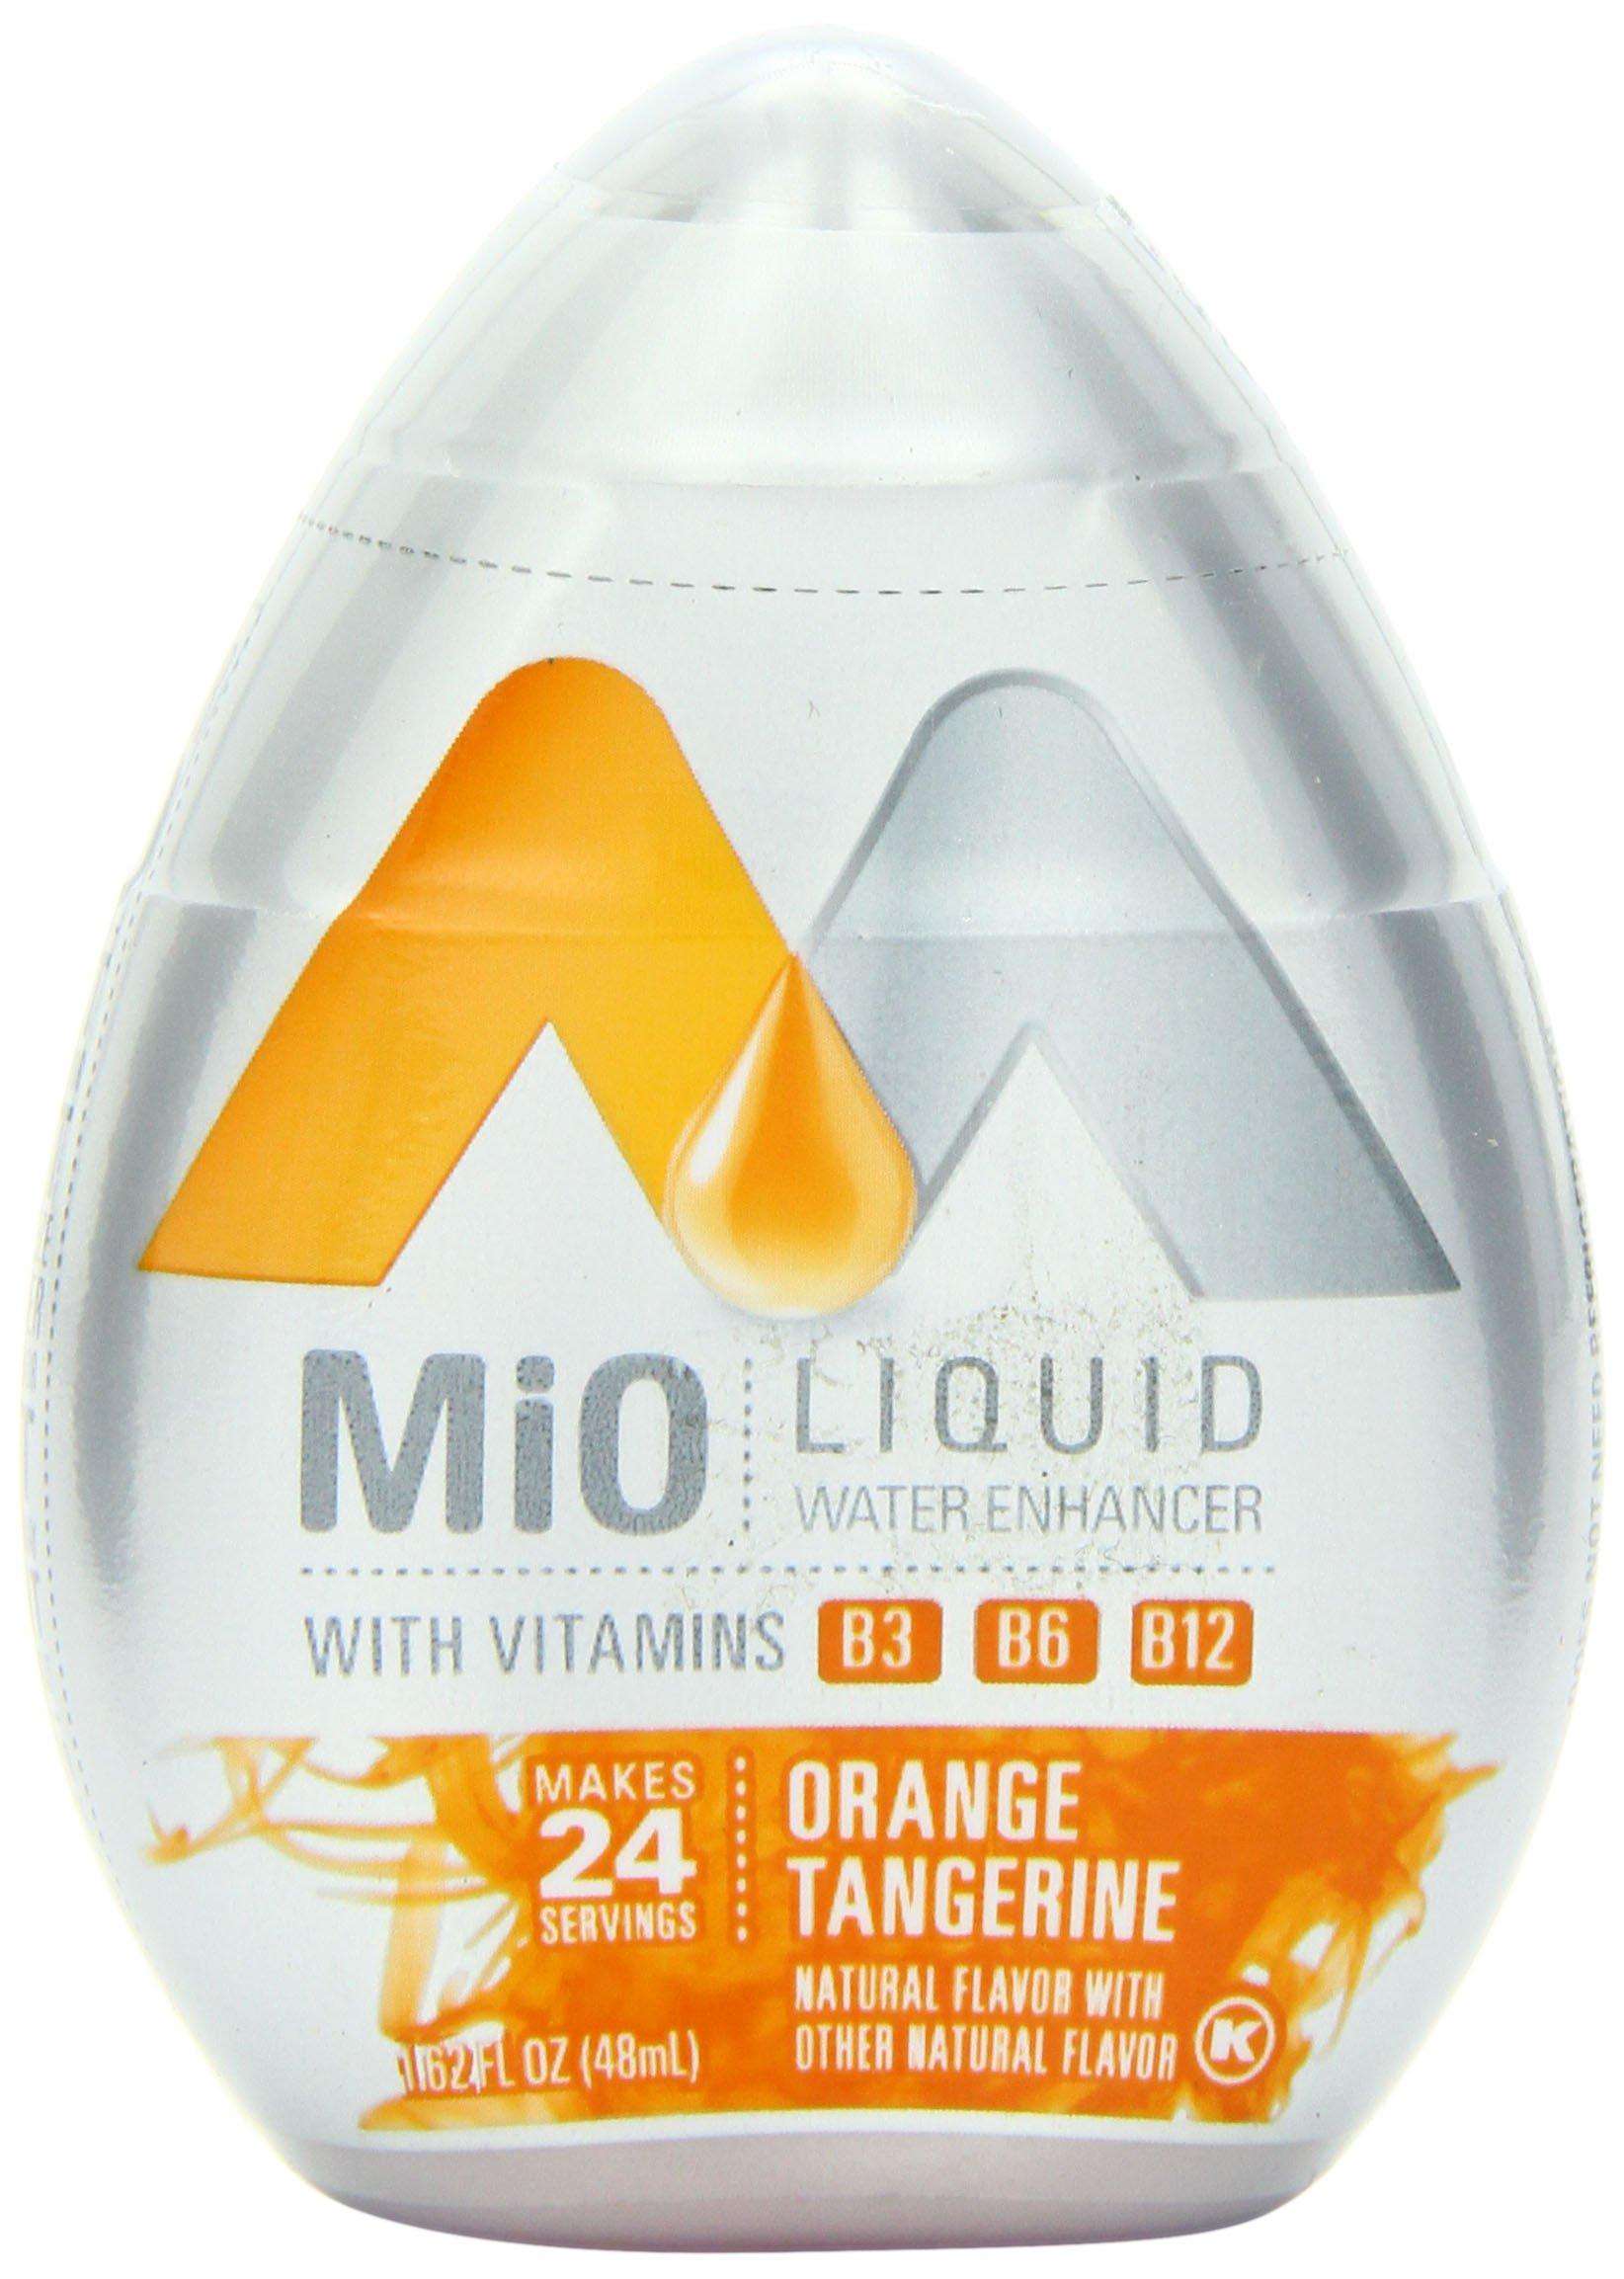 MiO Liquid Water Enhancer, Orange Tangerine, 1.62 Ounce